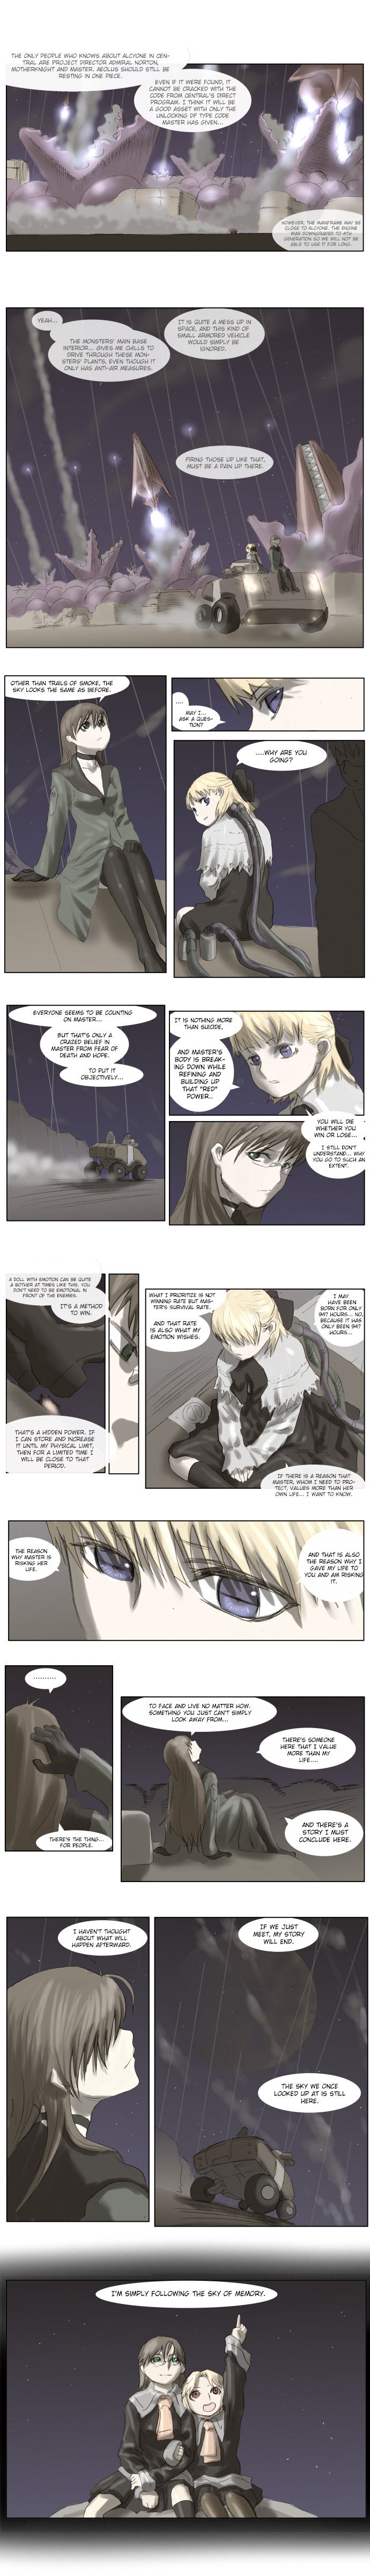 Knight Run 51 Page 2